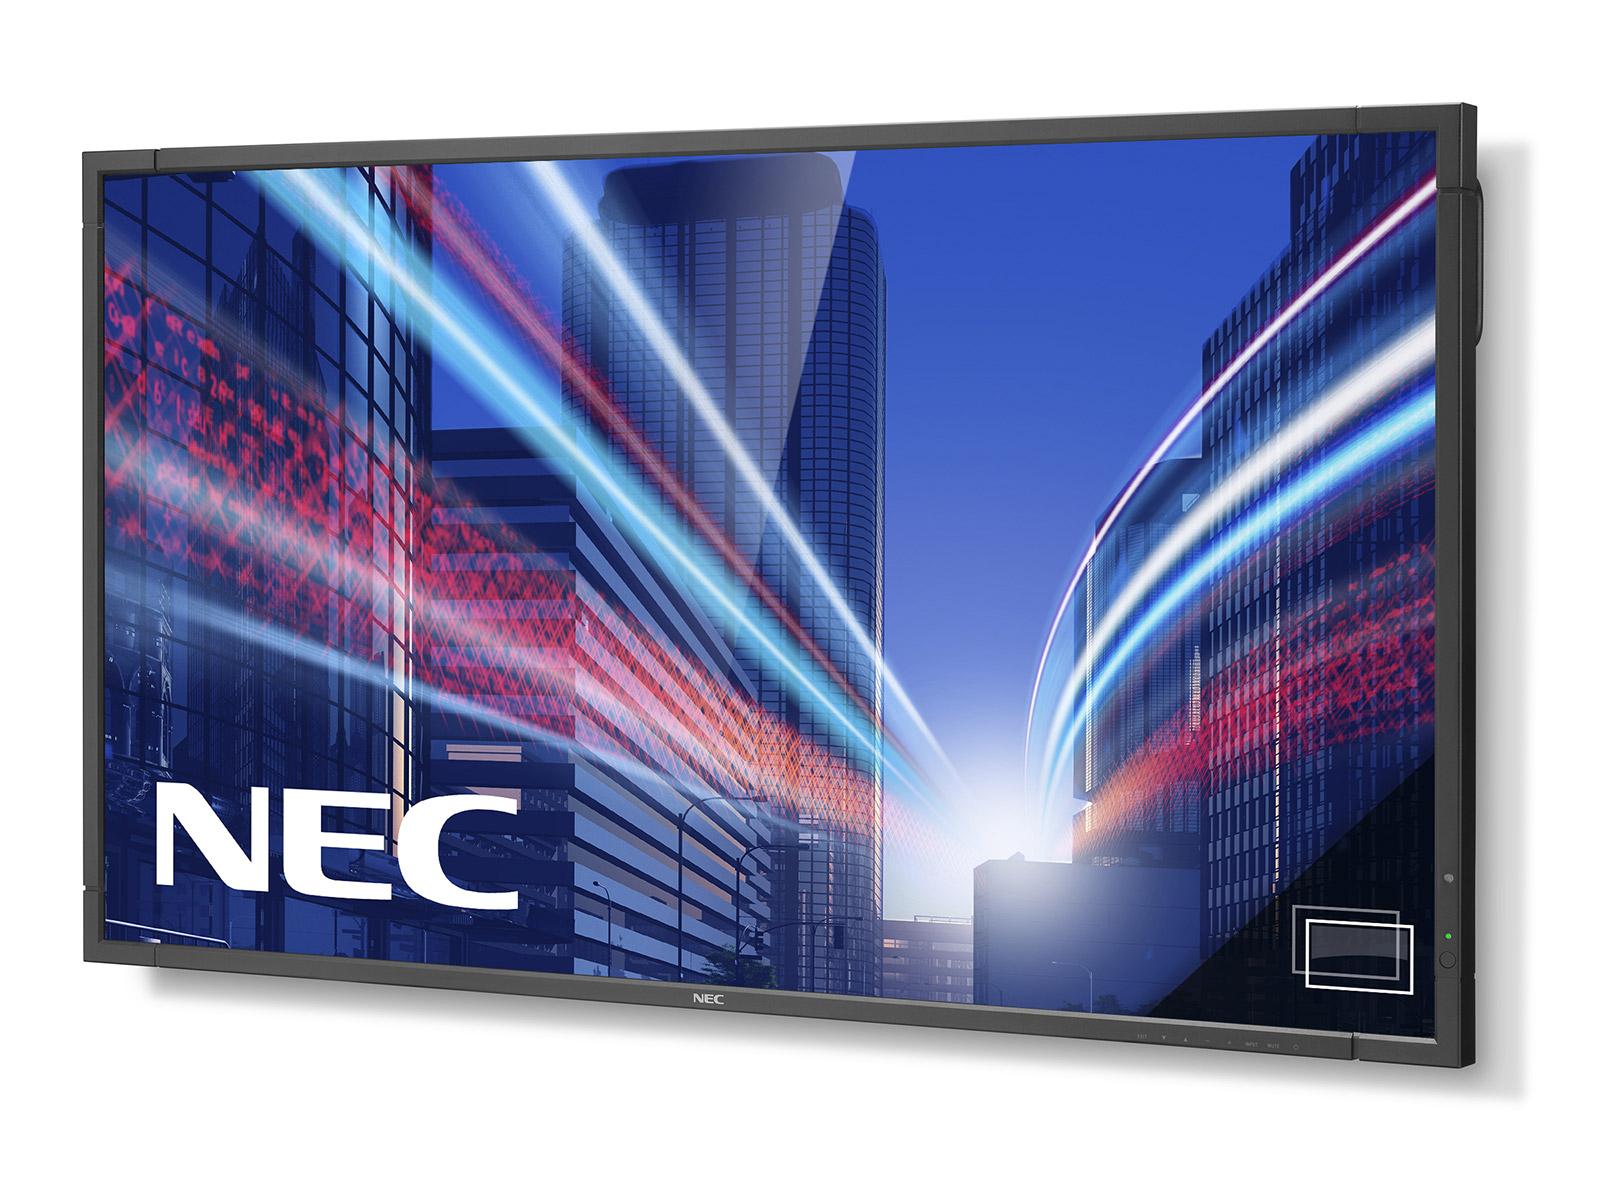 P801PG-DisplayViewLeftBlack-NEC